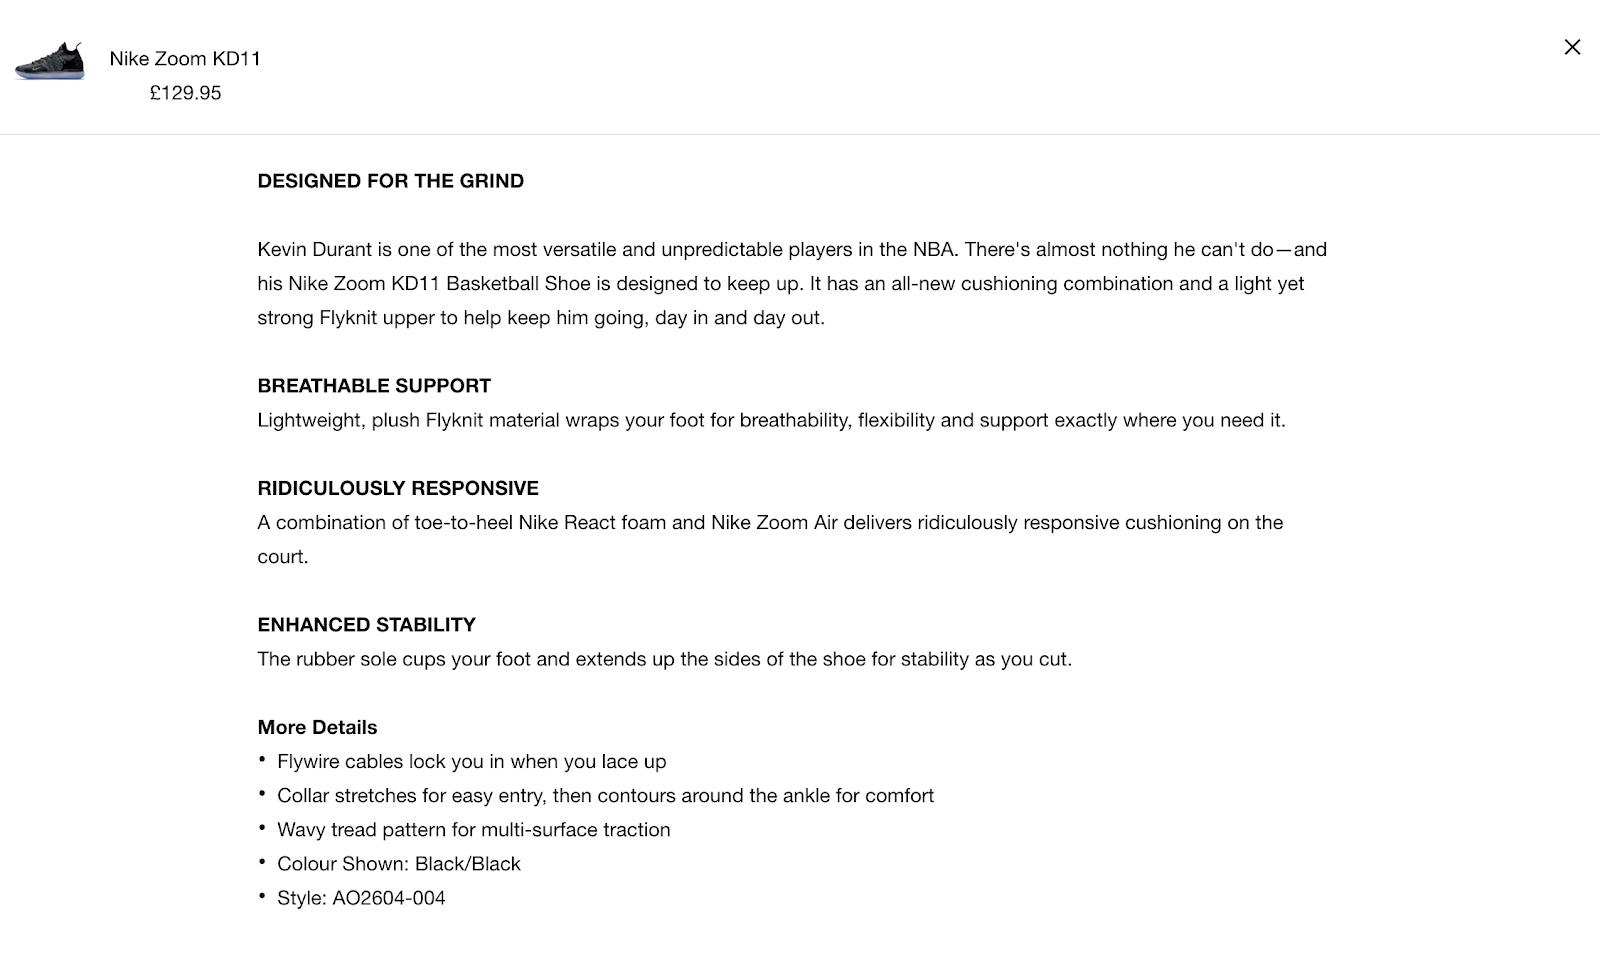 Screenshot showing product description for Nike shoes